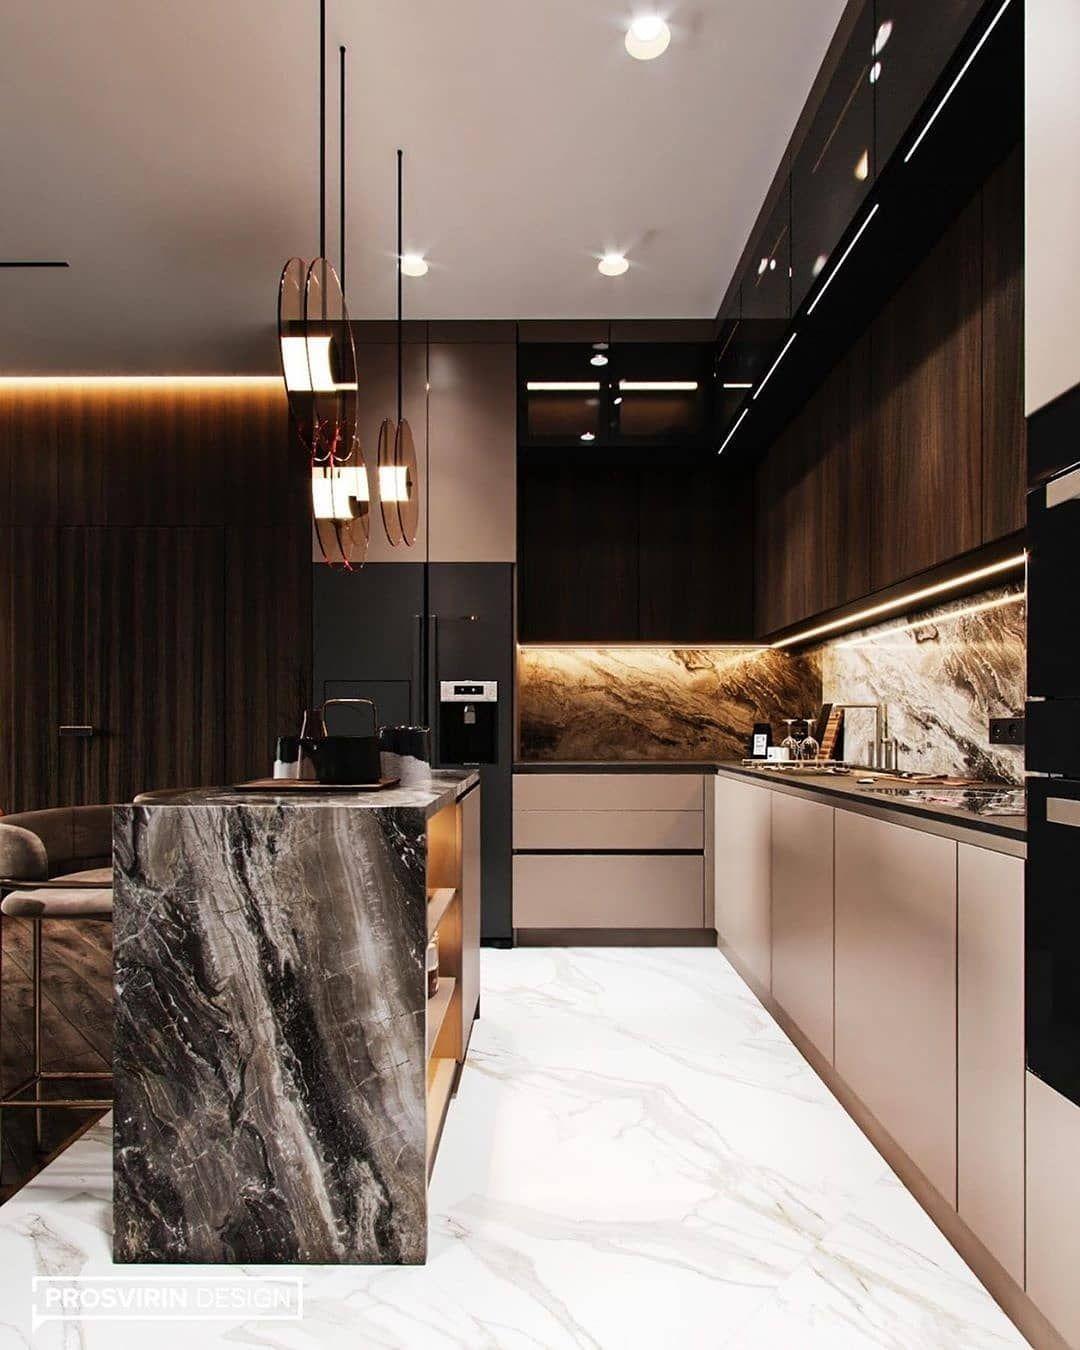 "INTERIOR FOR INSPO on Instagram: ""follow @interiorforinspo . what do think about this kitchen? . Reposted from @prosvirin_design . #moderninterior #interiordecor…"""